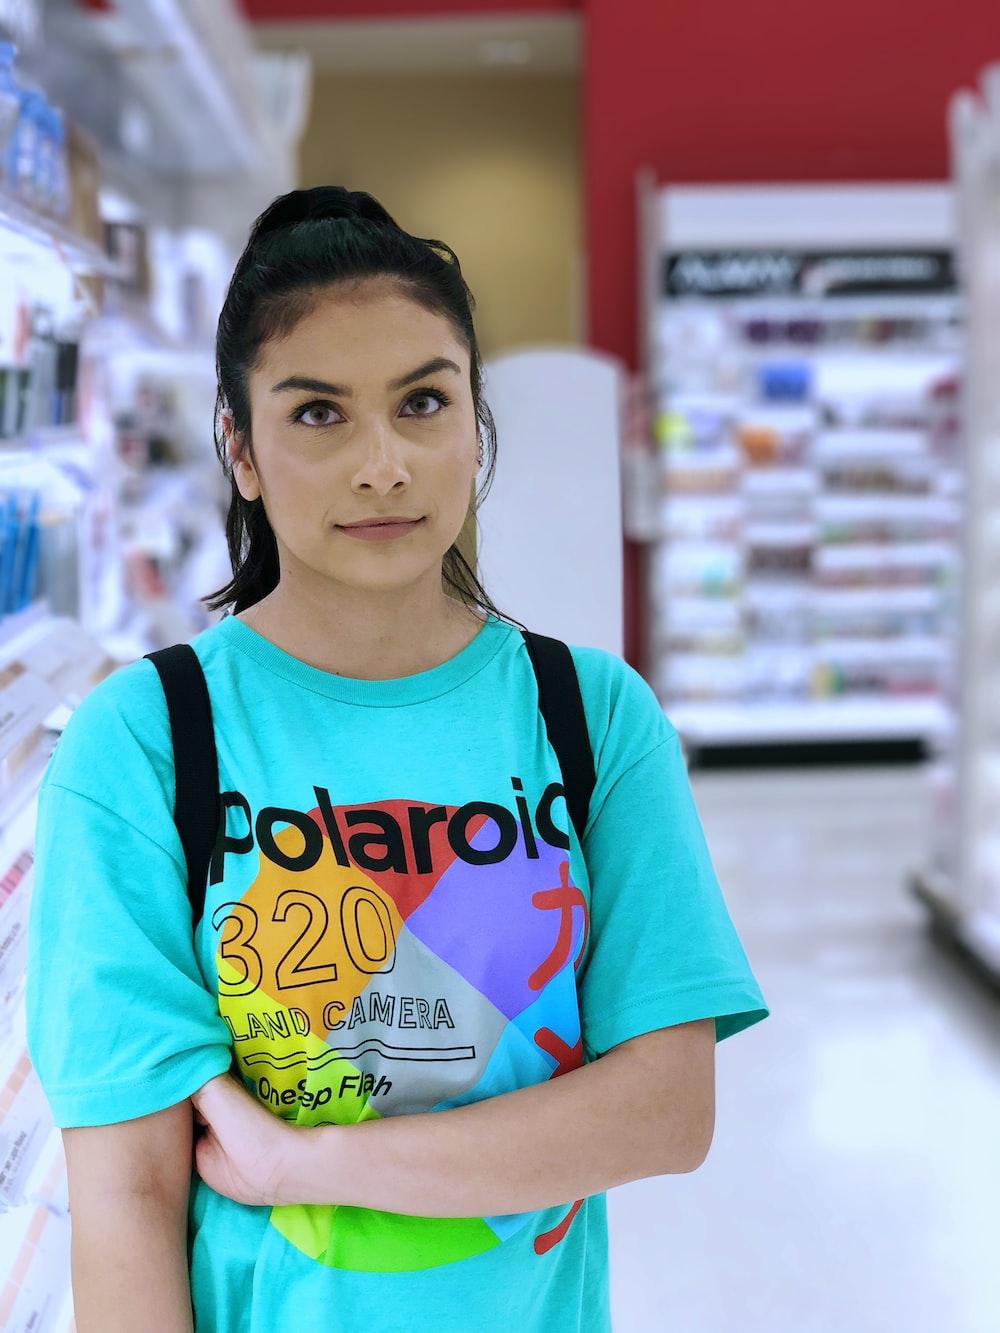 woman wearing teal crew-neck t-shirt